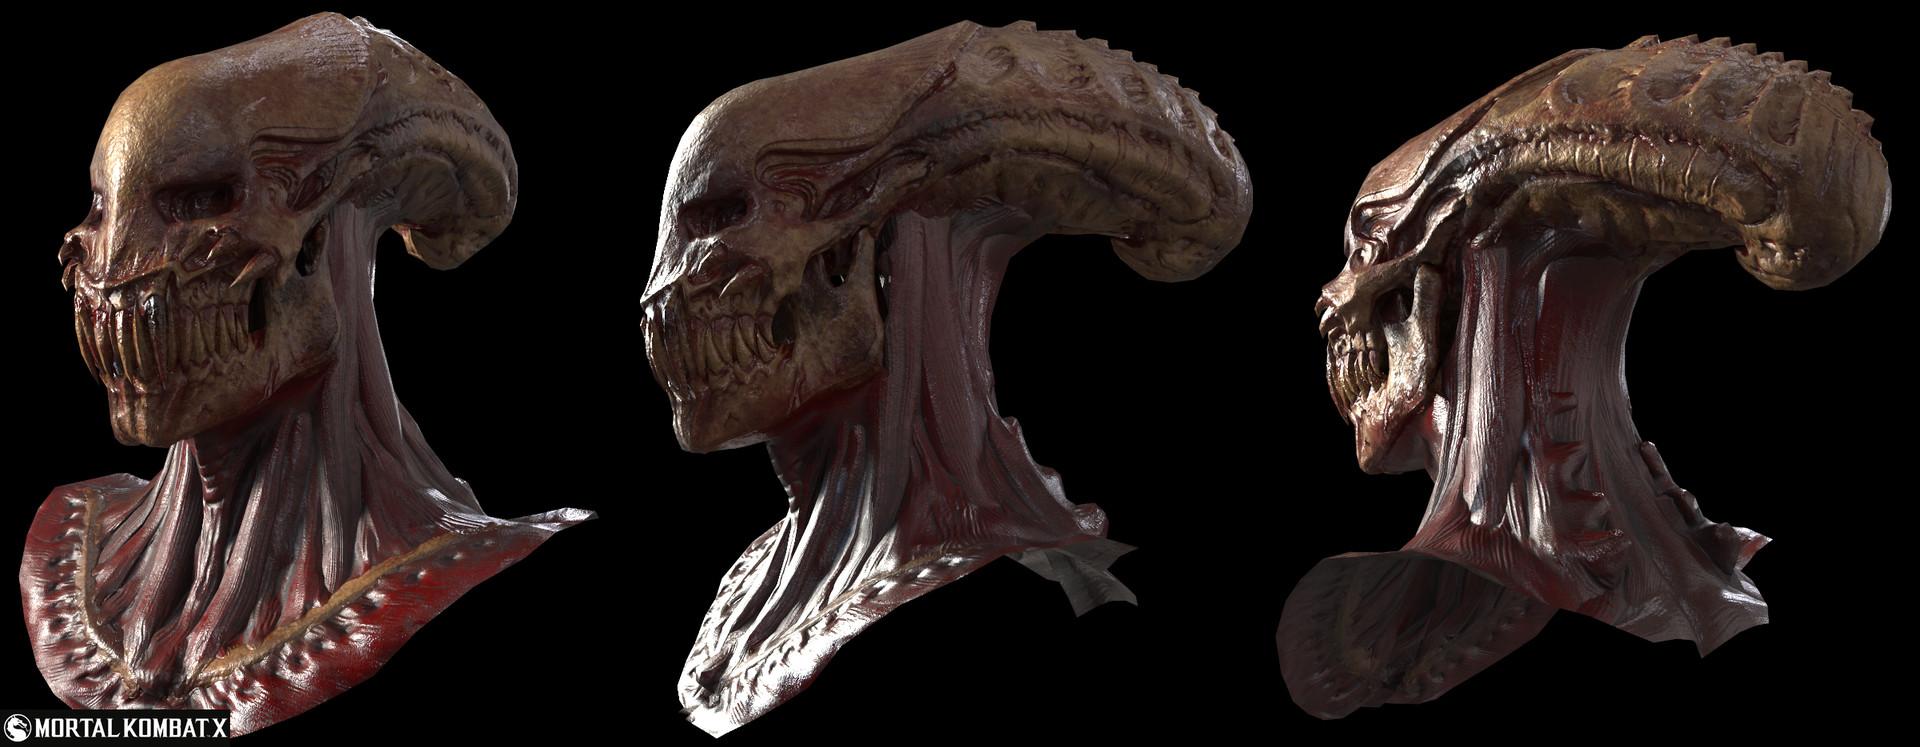 Giancarlo Arriola Xenomorph Skulls For Mortal Kombat X